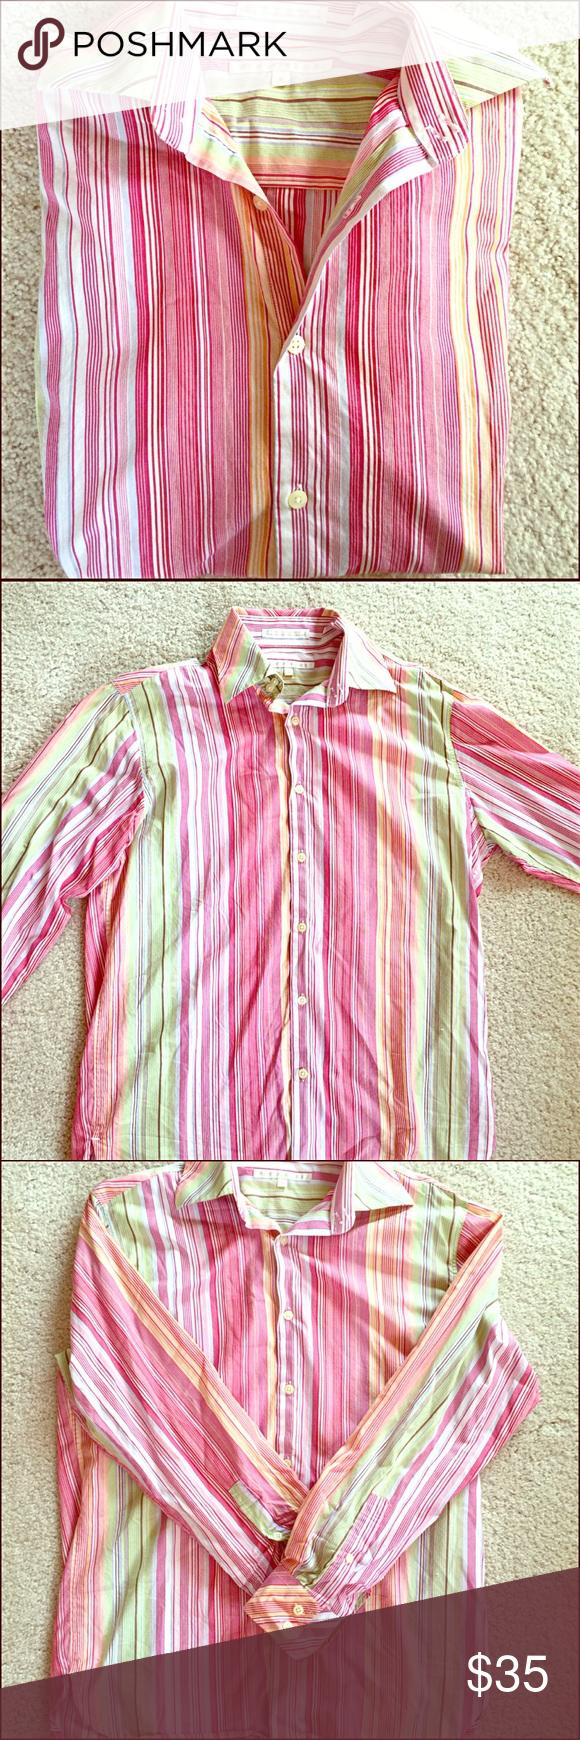 Casual pink dress shirt  HPPERRY ELLIS MENSu DRESS or CASUAL DRESS SHIRT Boutique  Perry